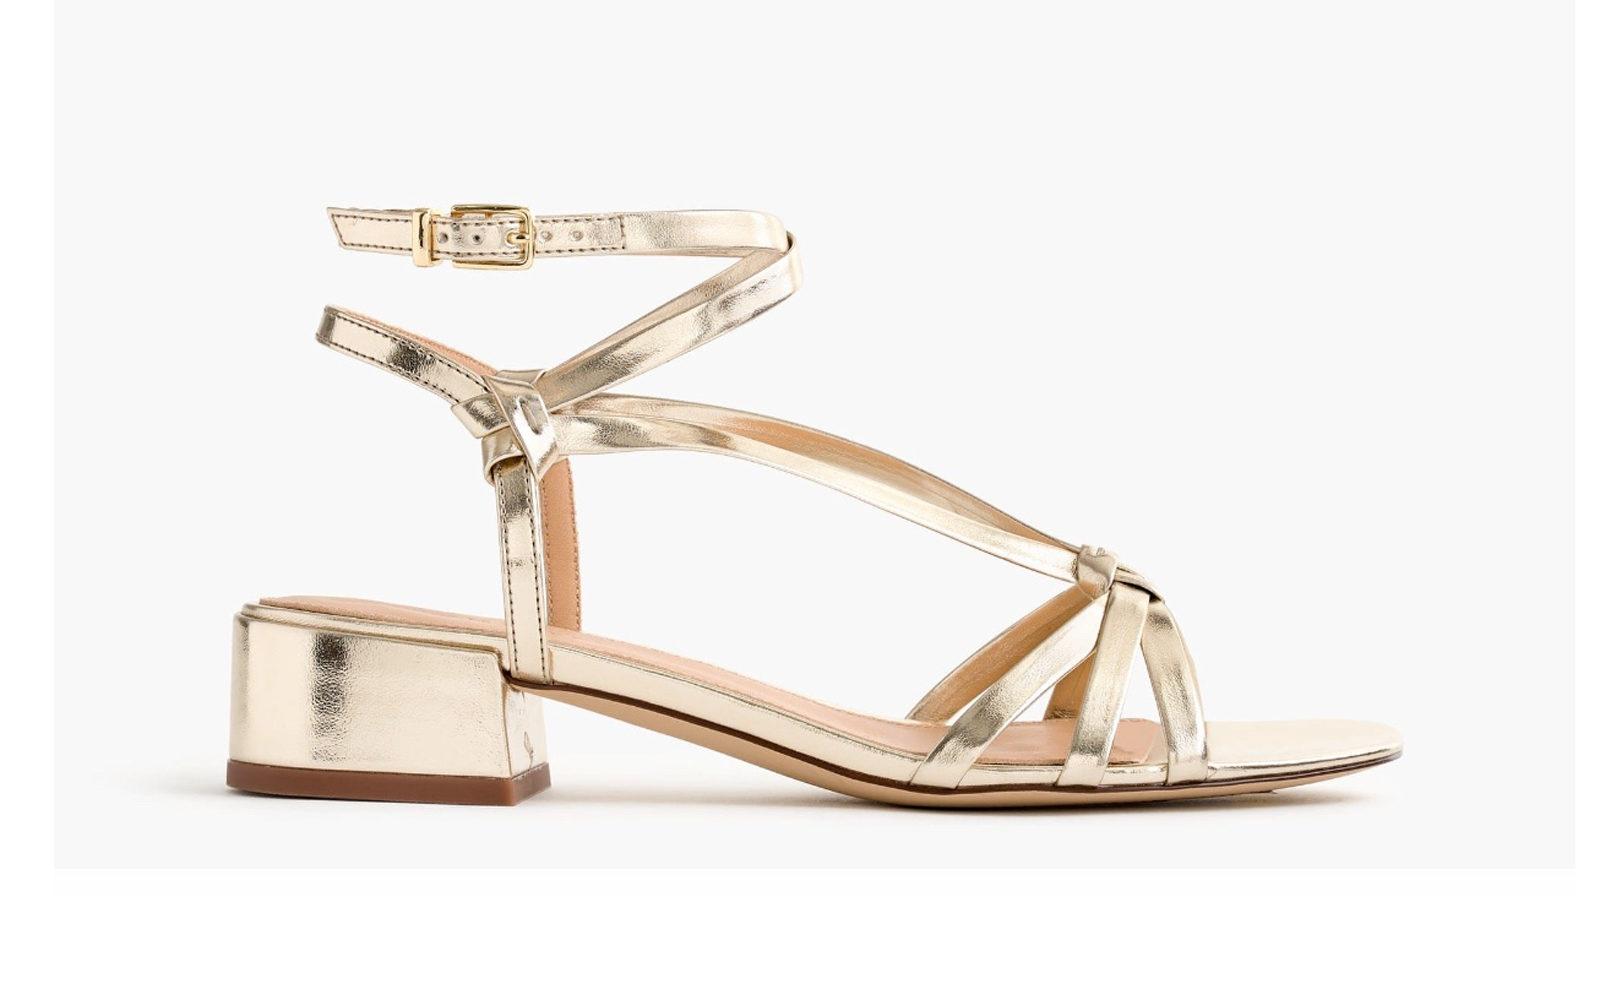 J.Crew lady sandals